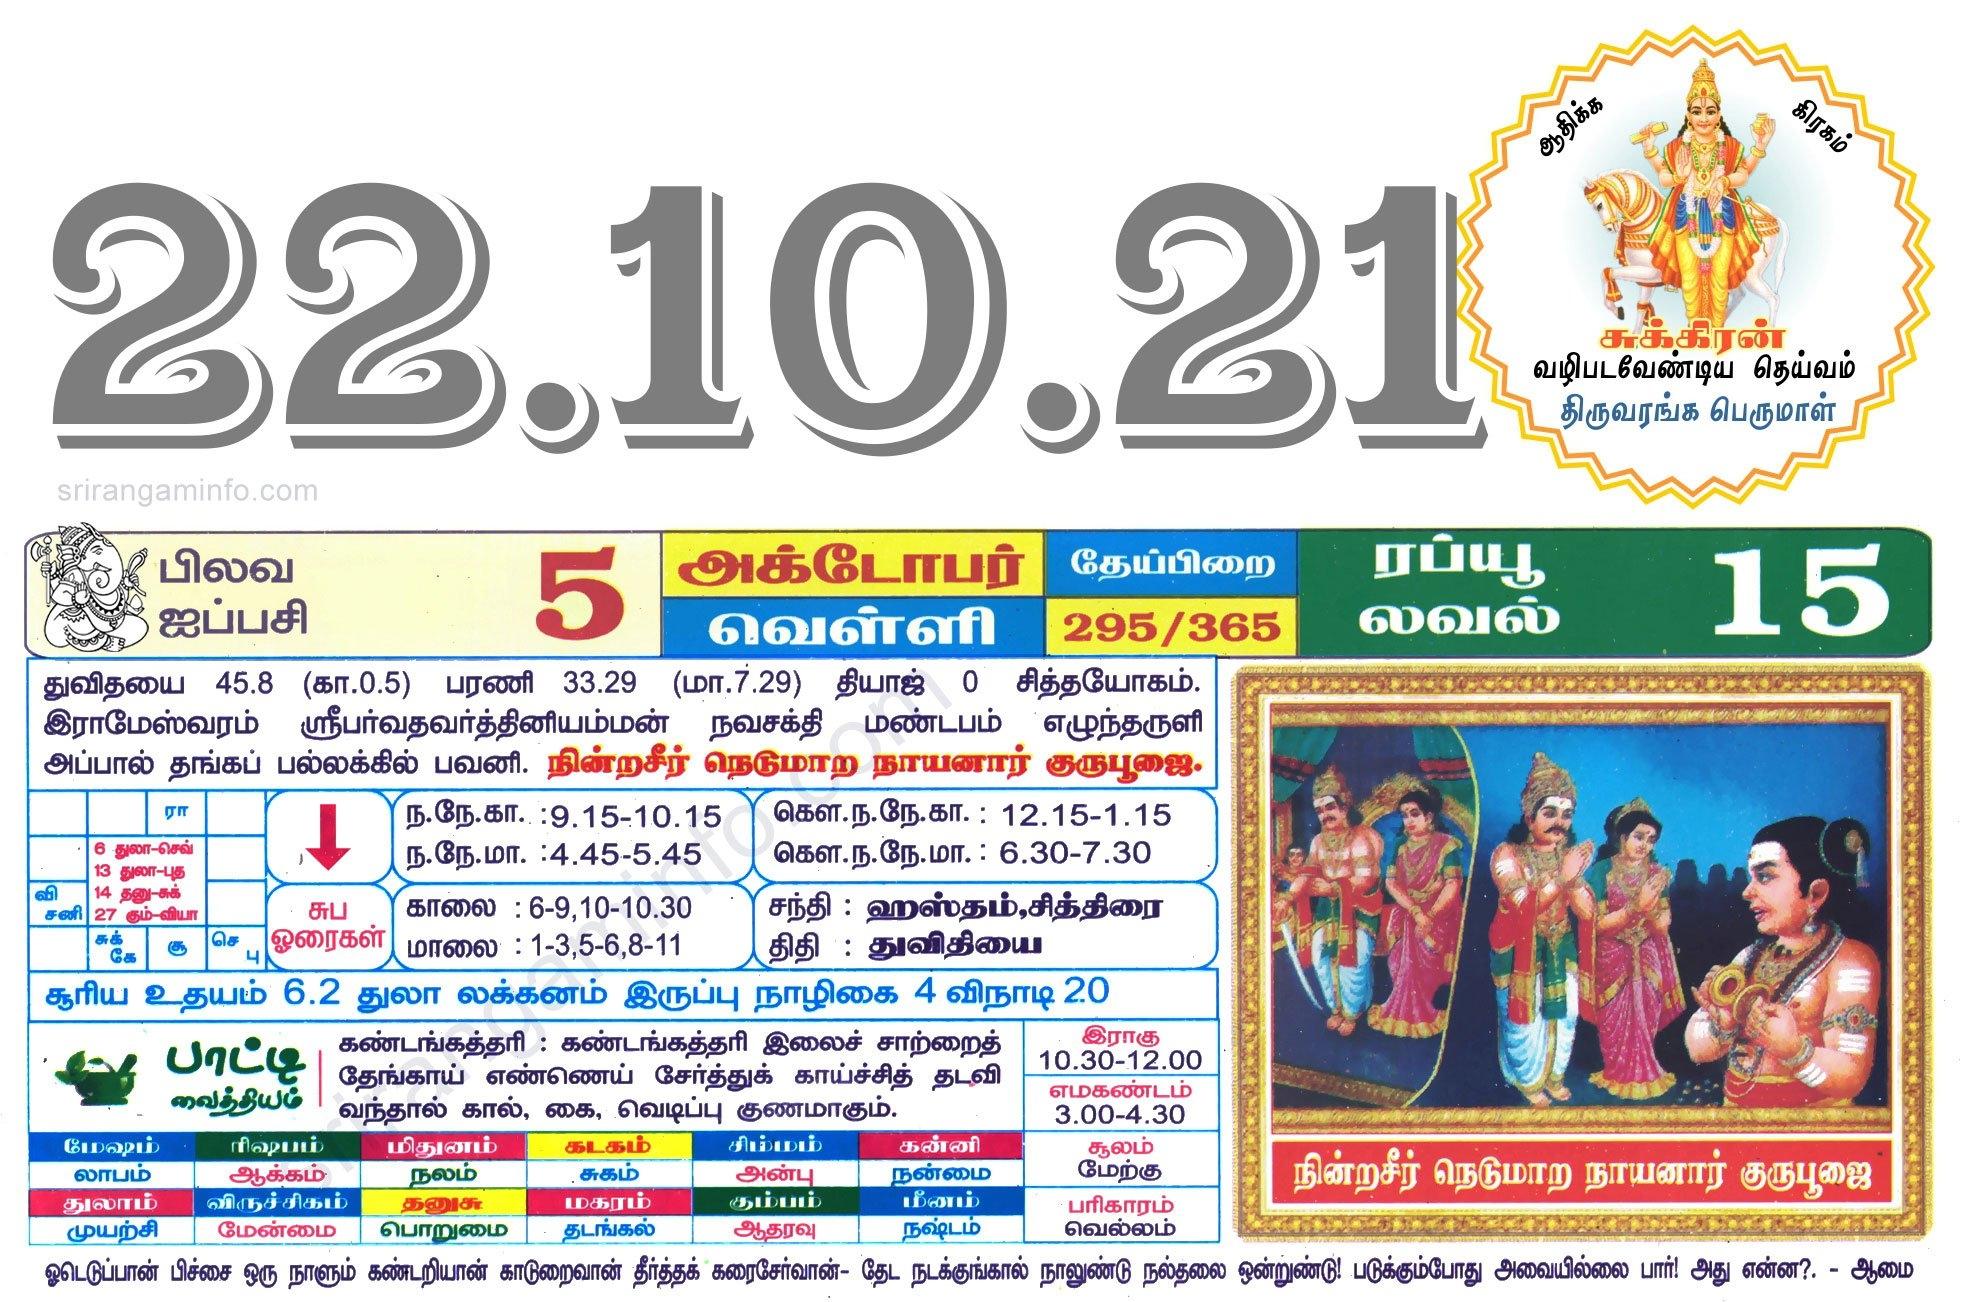 Tamil Daily Calendar 2021, Tamil Calendar 2021, Nalla Neram - தமிழ் தினசரி காலண்டர் with regard to 2021 Tamil Calendar Holidays Image